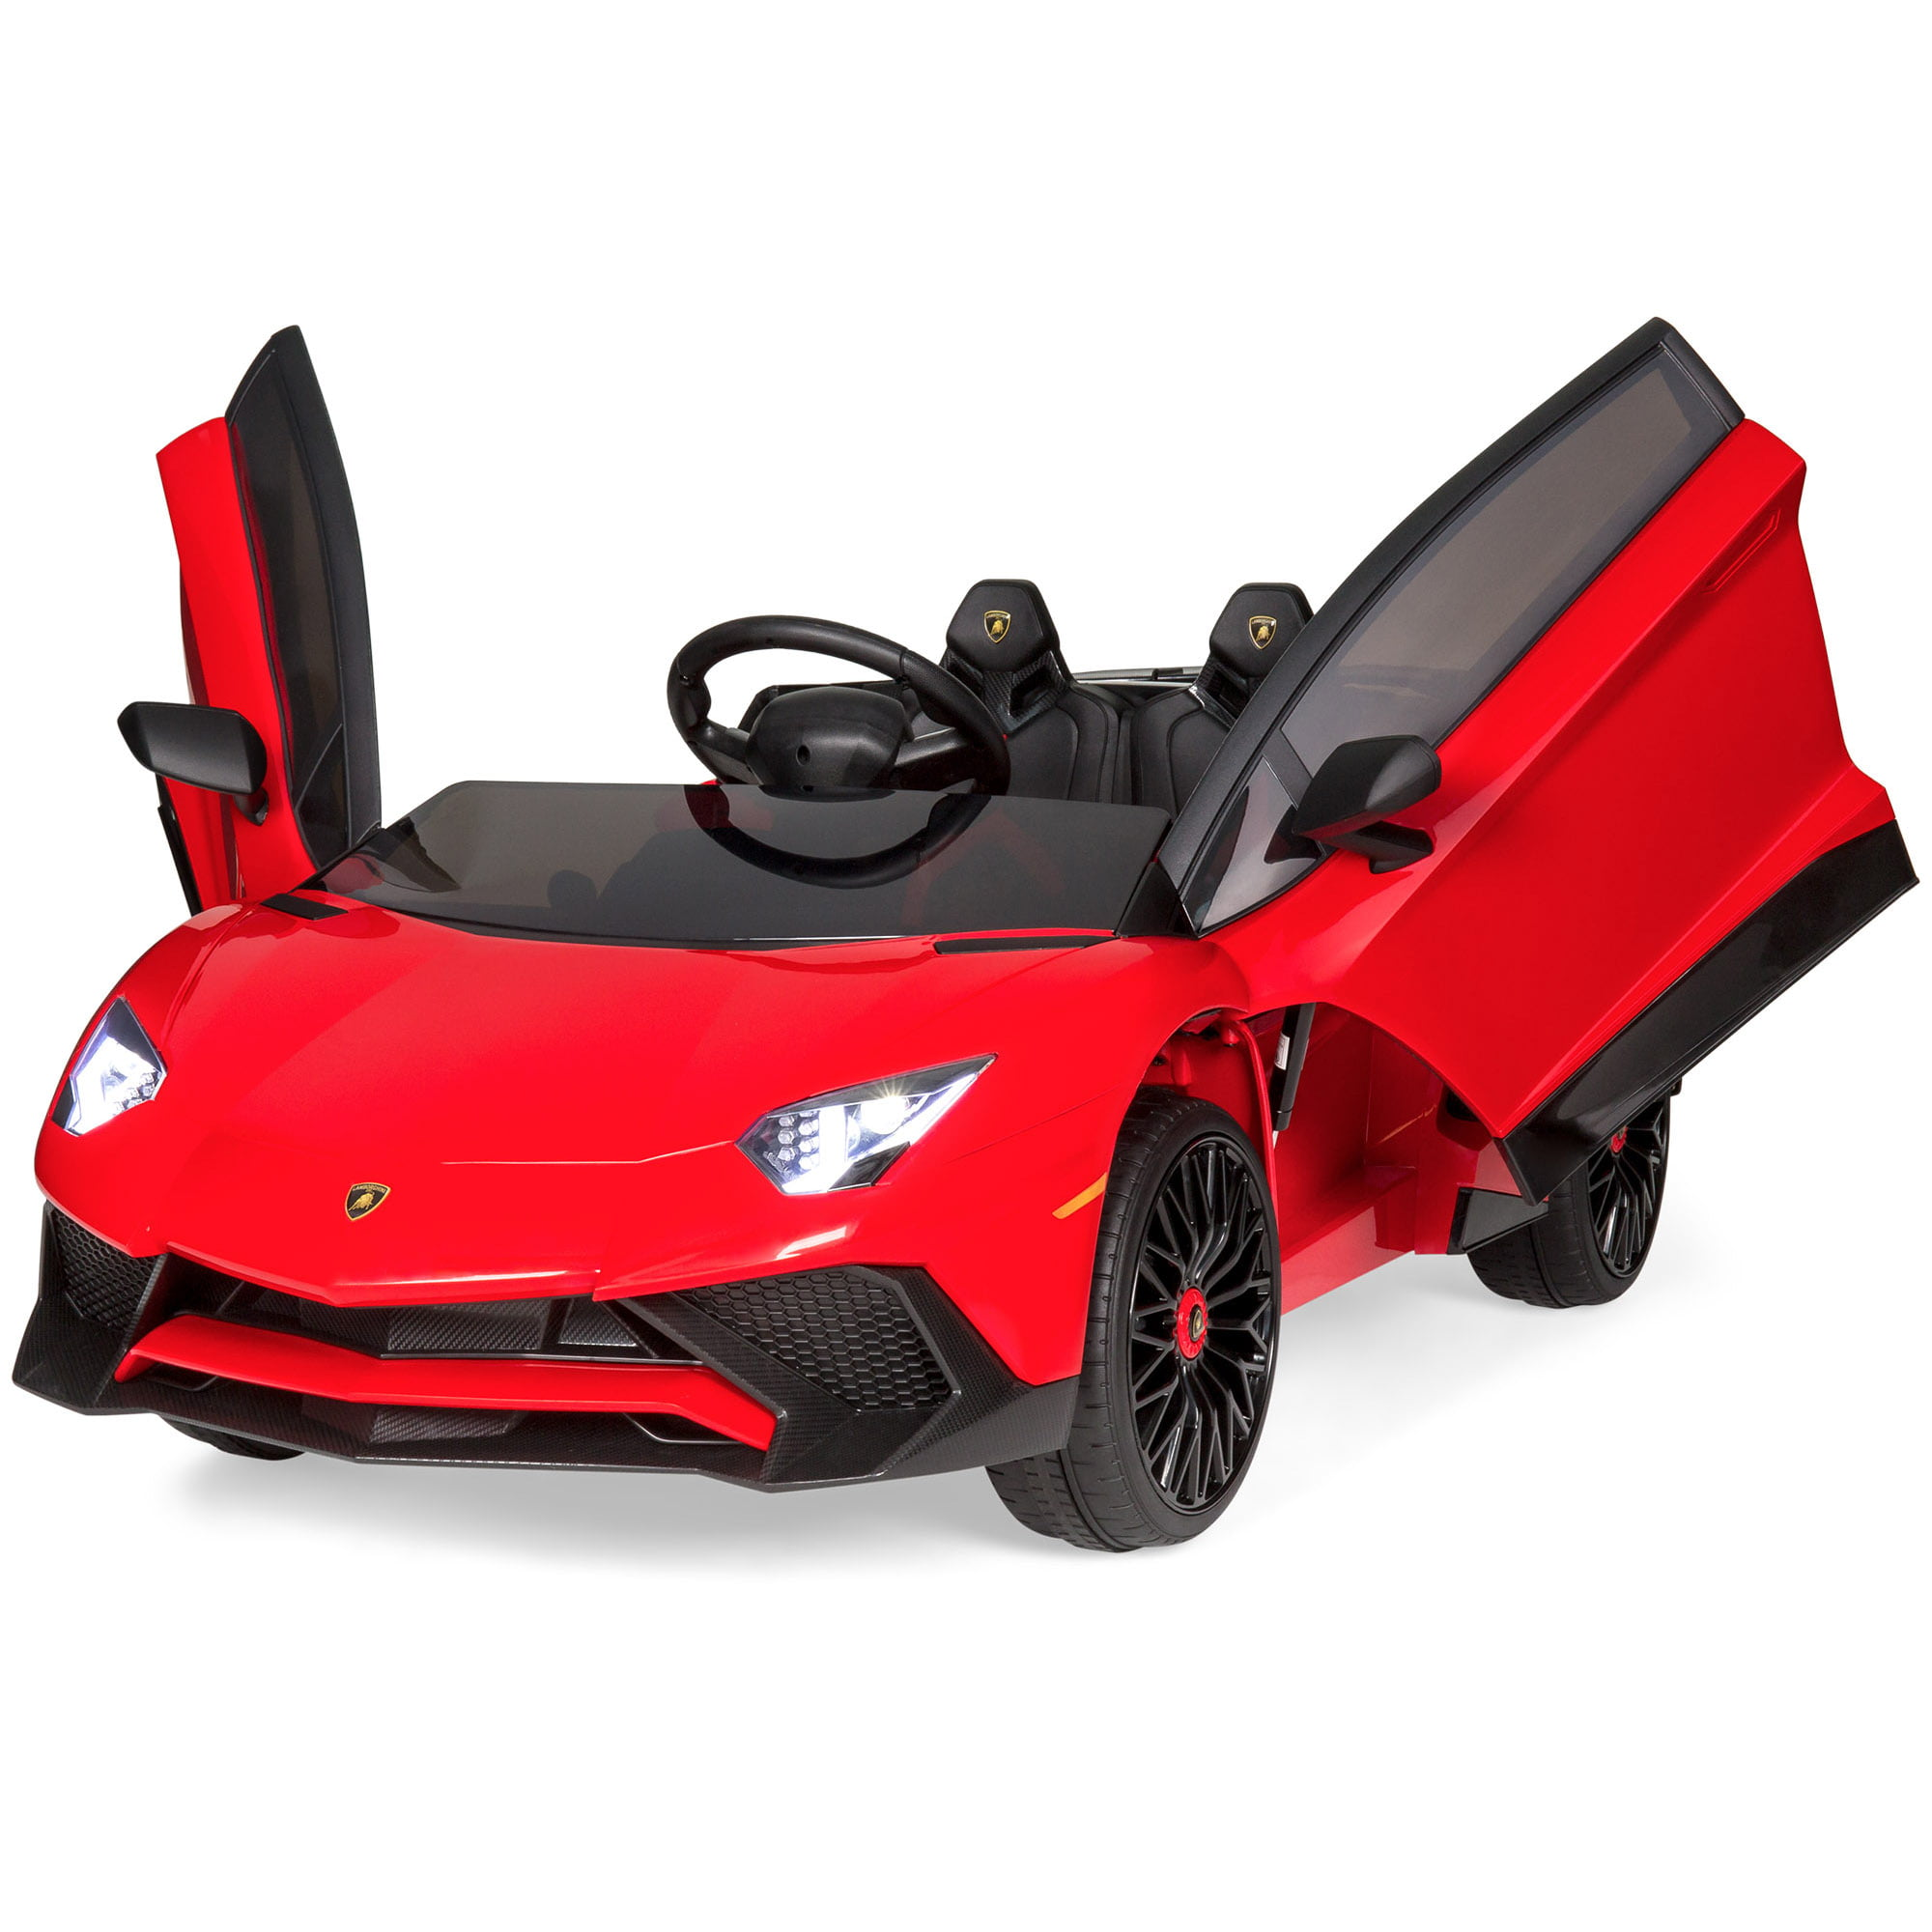 Best Choice Products Kids 12v Ride On Lamborghini Aventador Sv Sports Car Toy W Parent Control Aux Cable Red Walmart Com Walmart Com